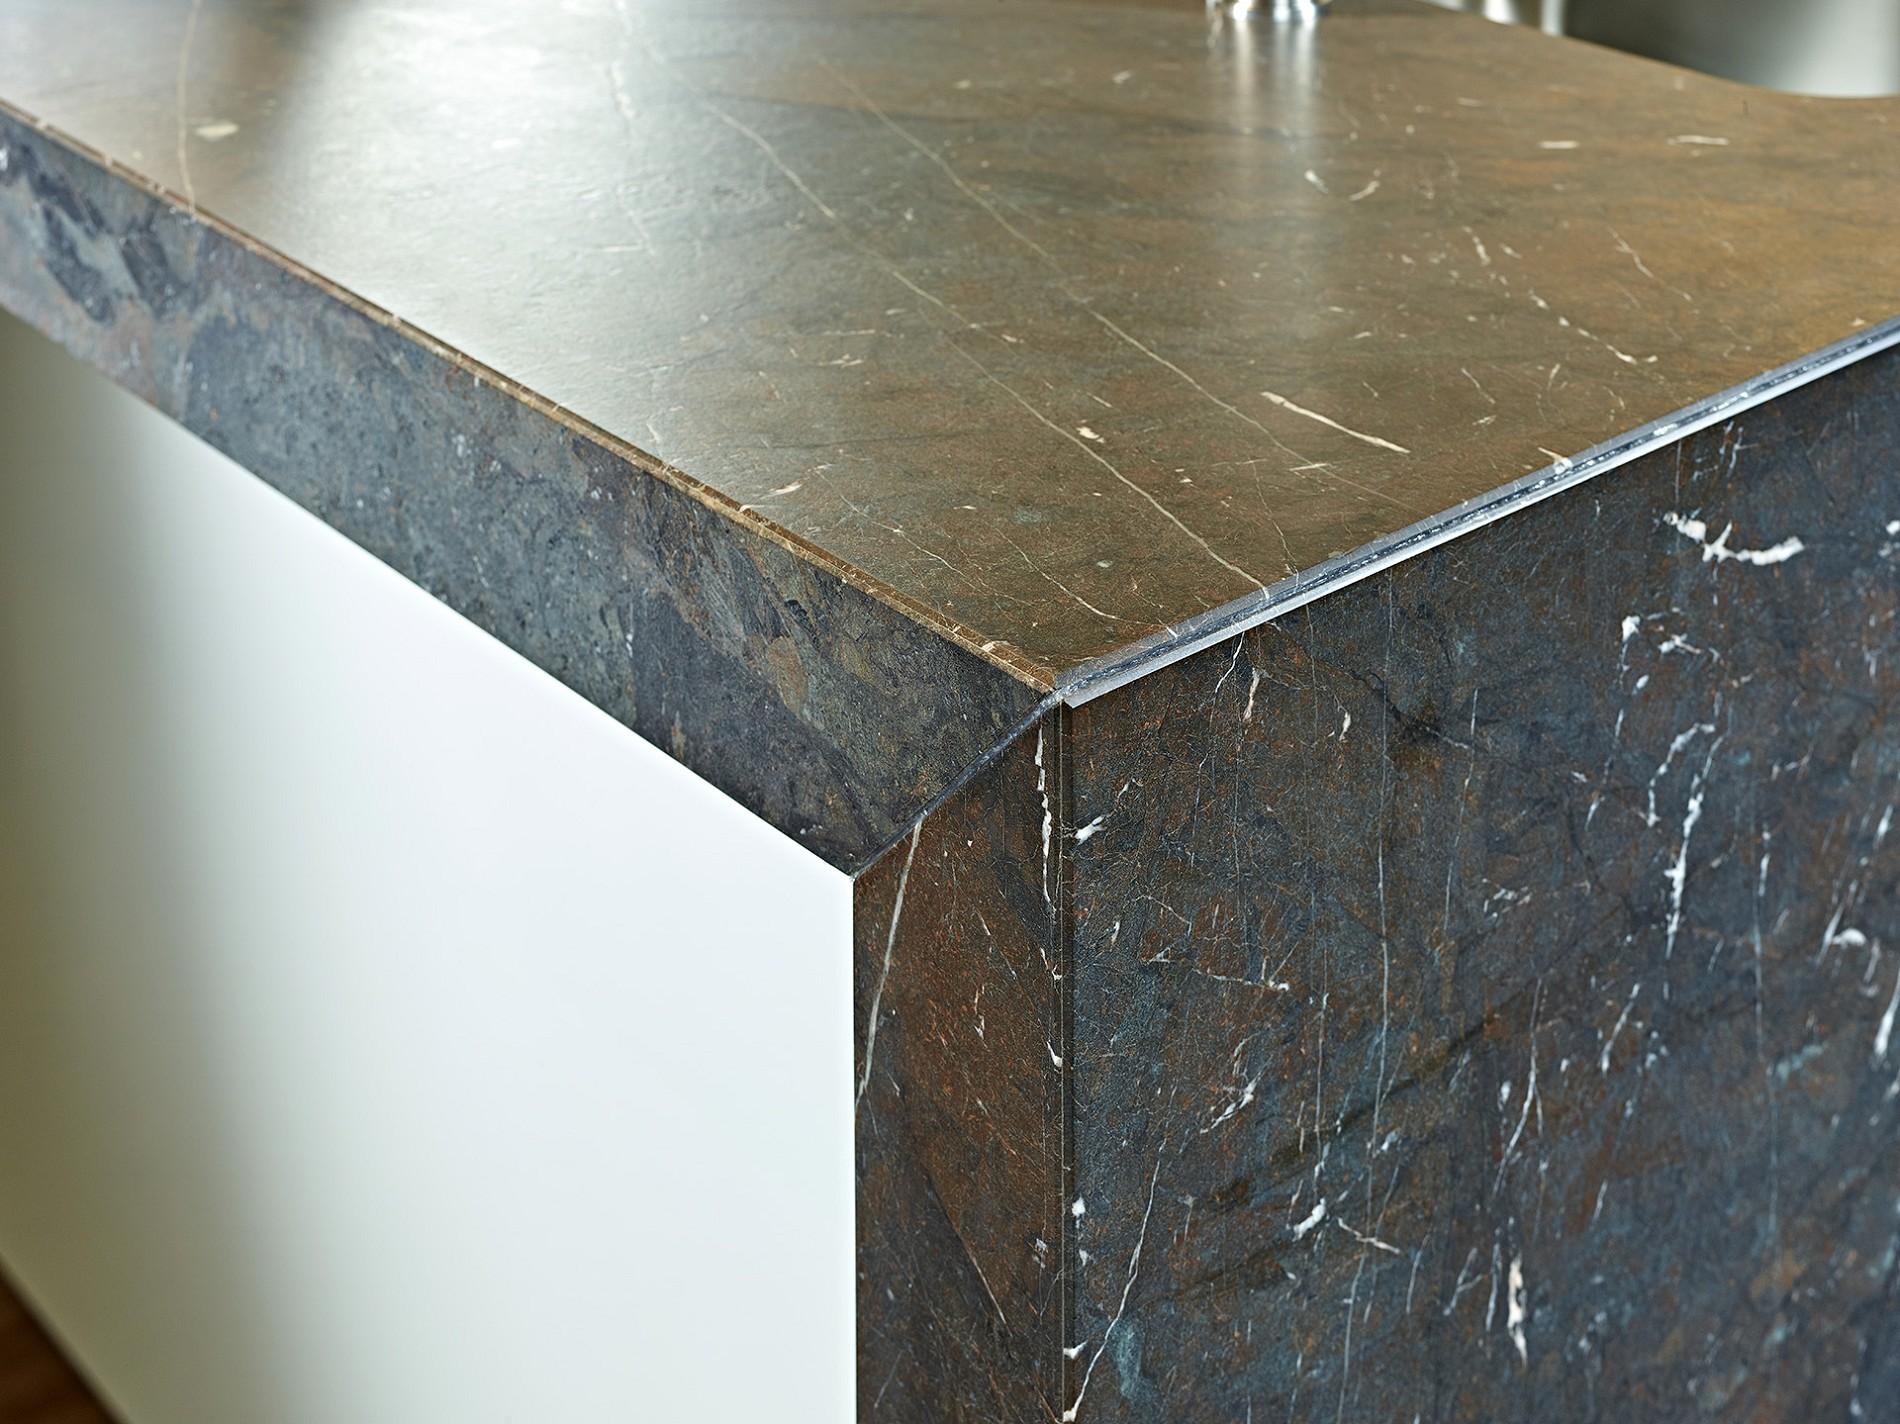 Full Size of Granit Arbeitsplatte Baslimline Inselkche Mit Besonderer Koje Küche Sideboard Arbeitsplatten Granitplatten Wohnzimmer Granit Arbeitsplatte